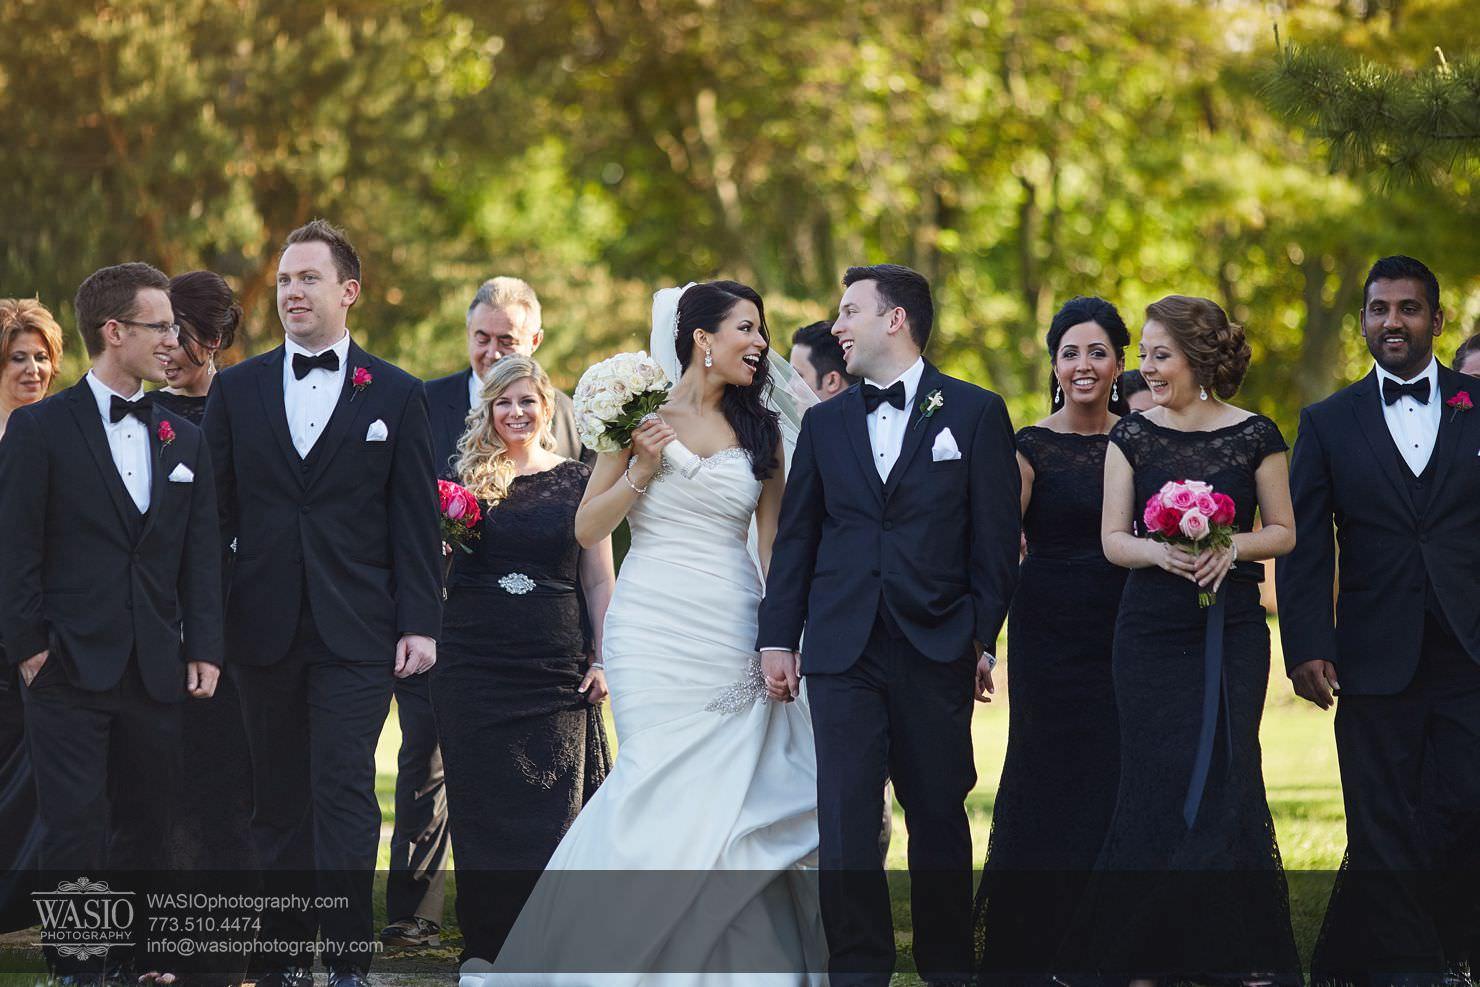 032_Chicago-Spring-Wedding_Chrissy-Andrew_3P4C5929 Chicago Spring Wedding - Chrissy + Andrew